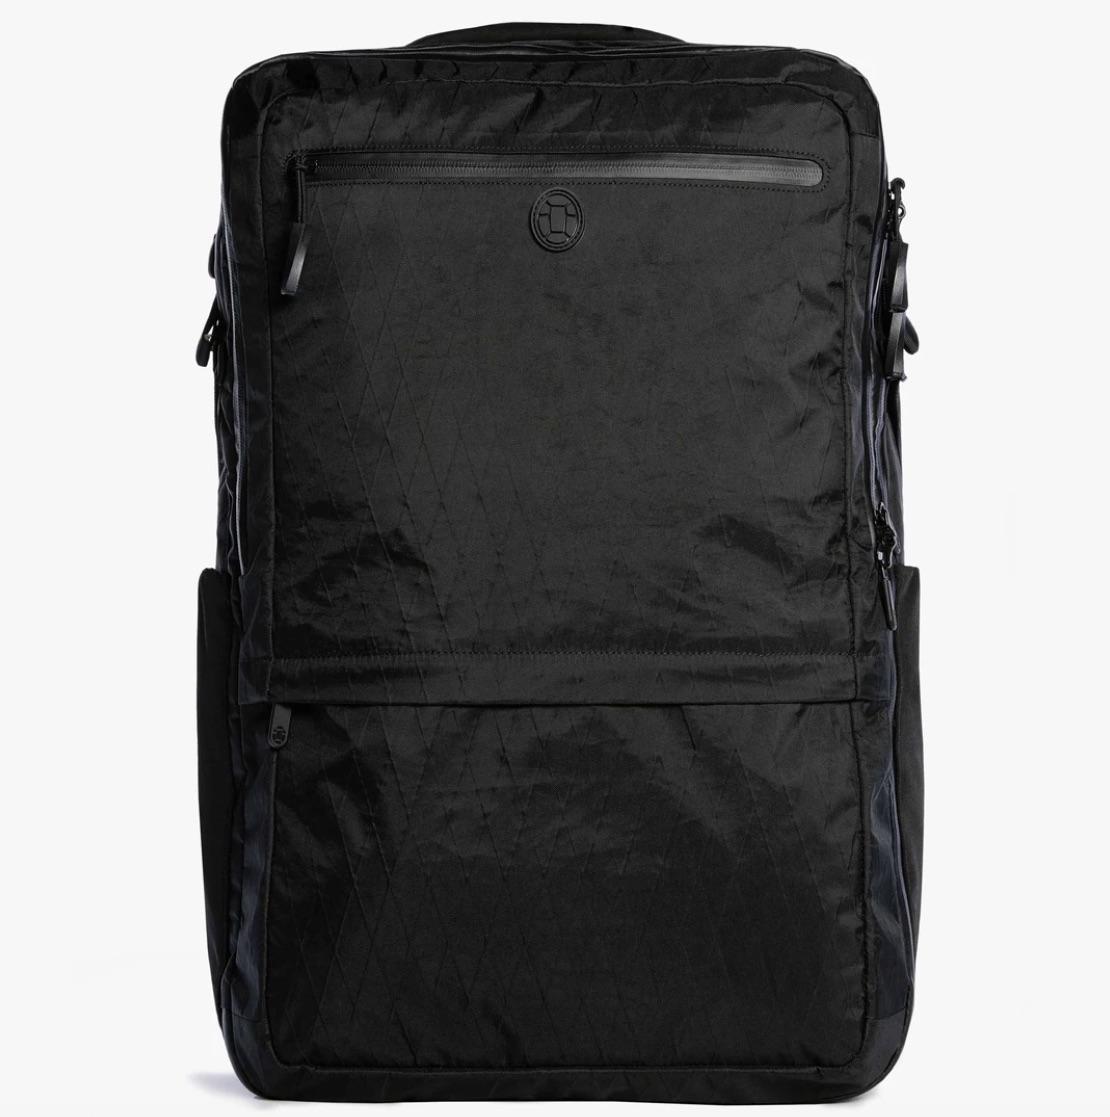 Tortuga's Outbreaker Backpack